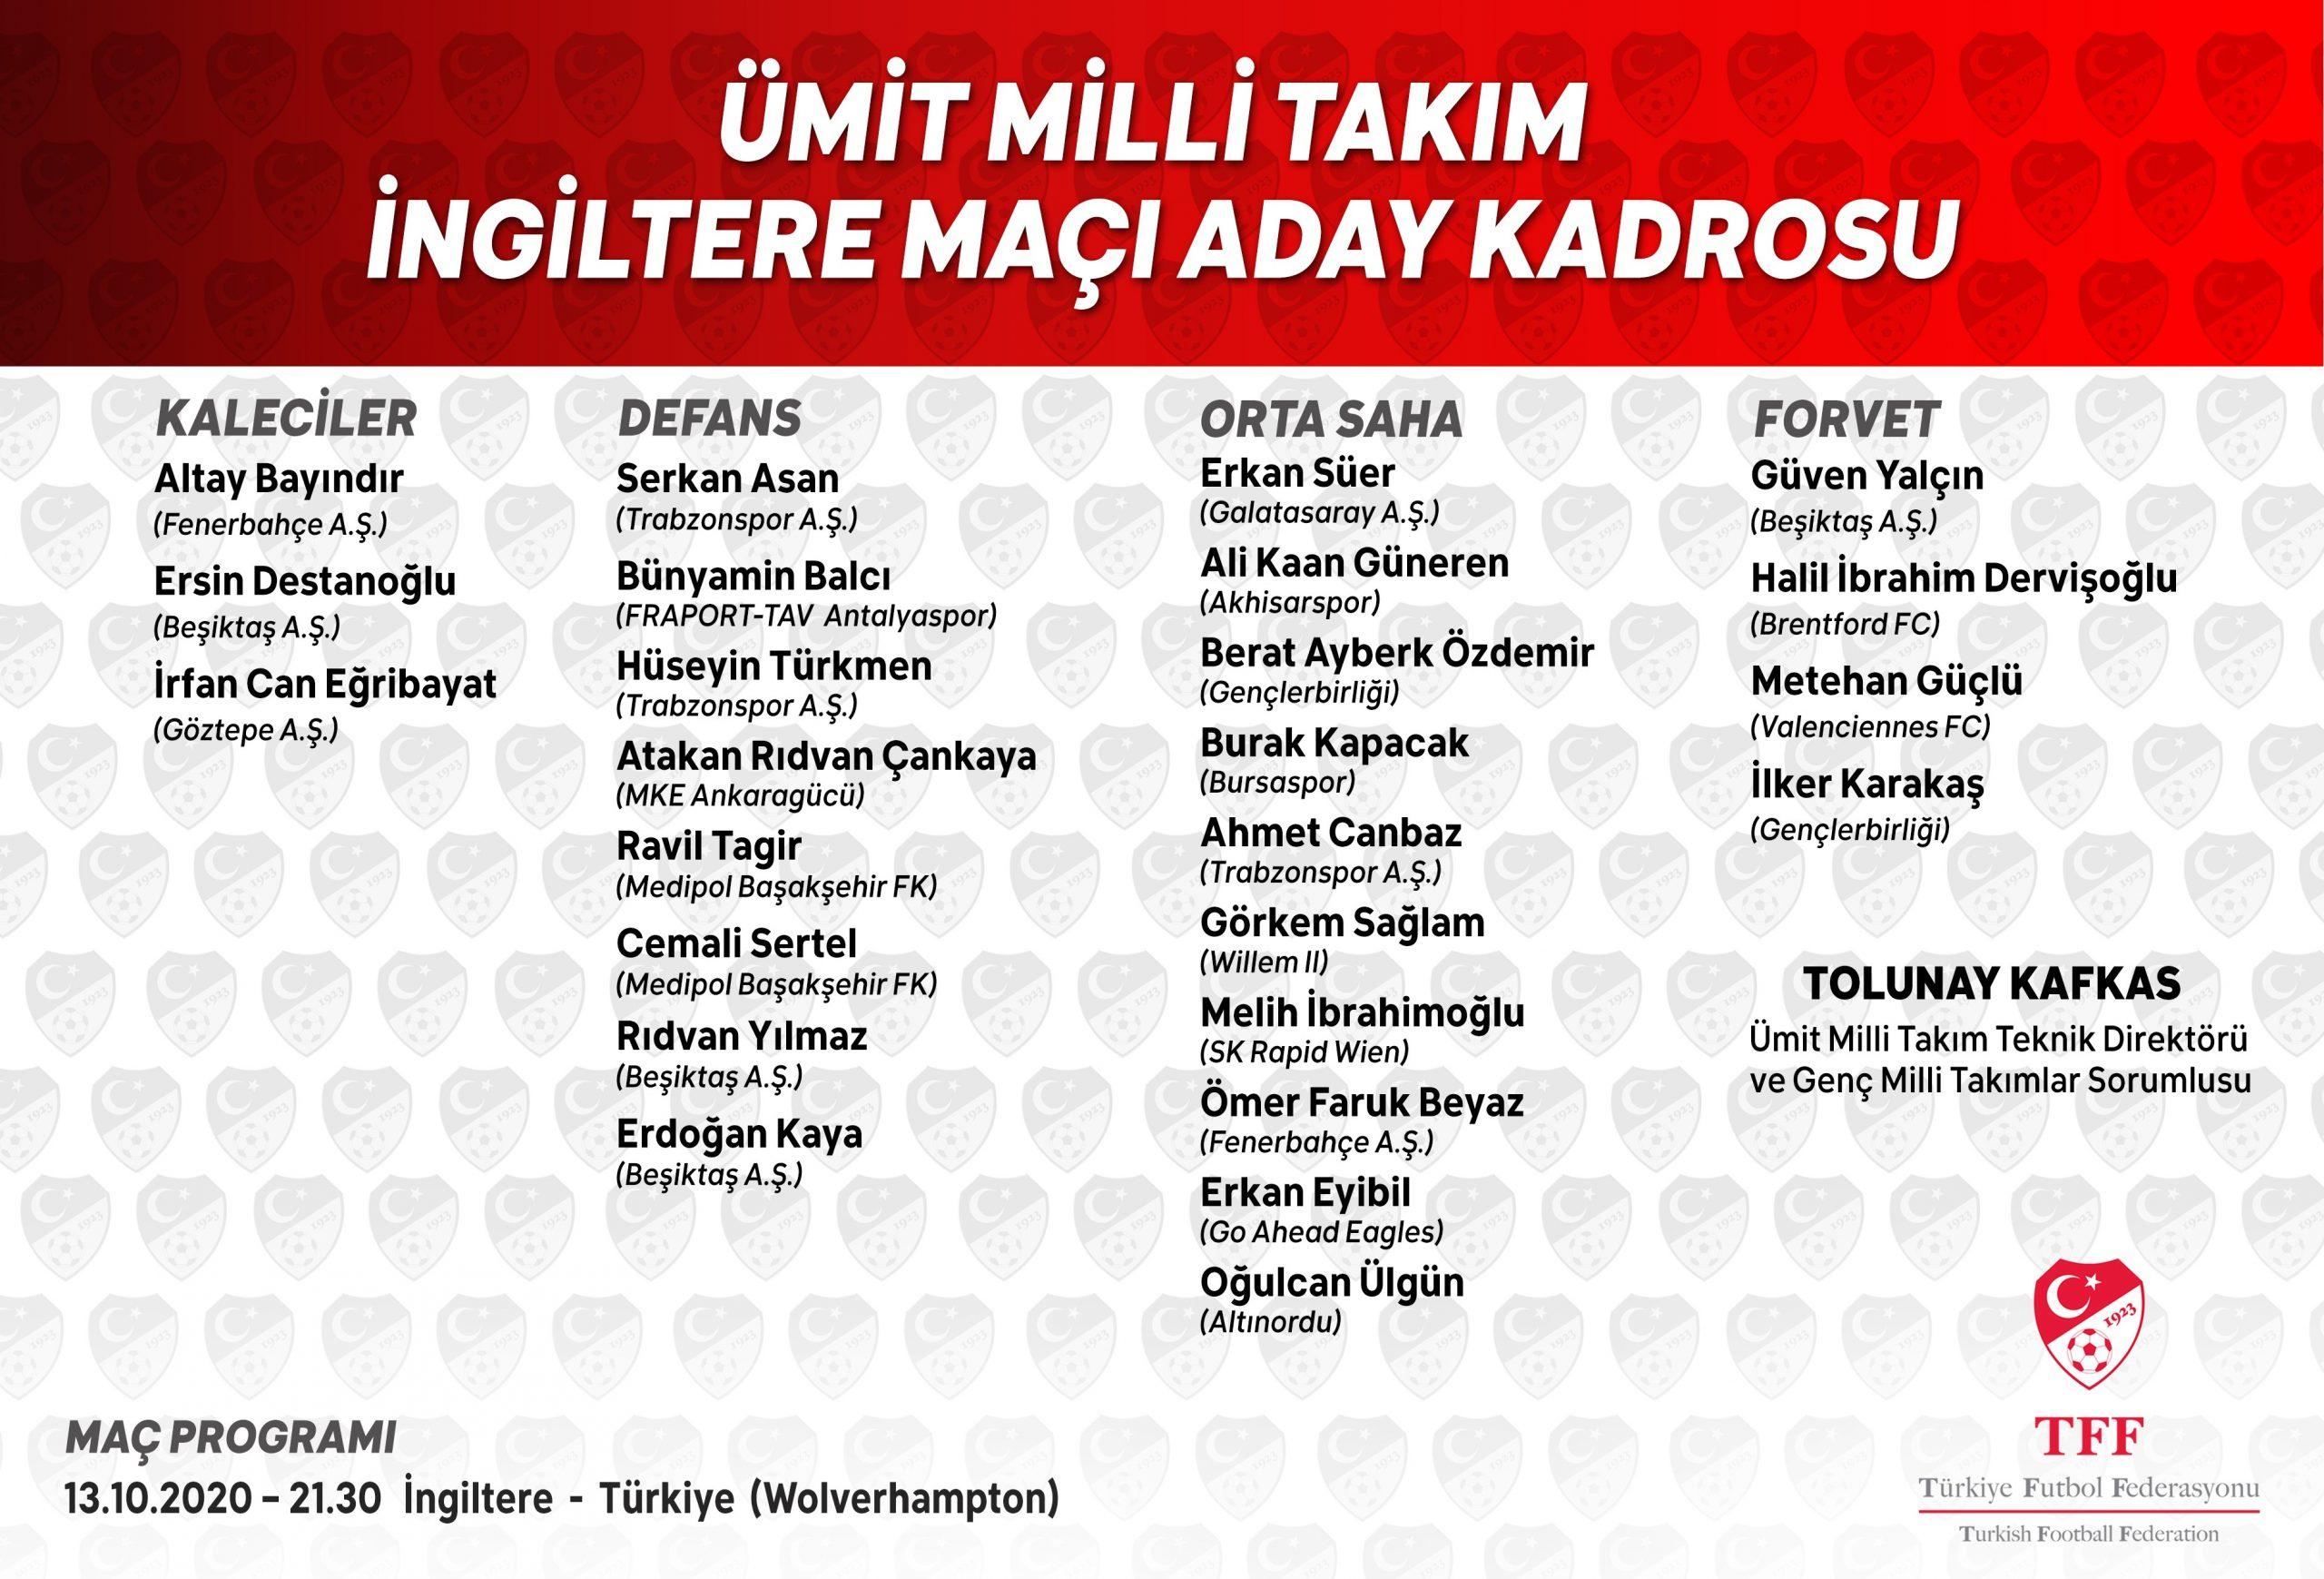 Ümit Milli Takıma Trabzonspor'dan 3 oyuncu